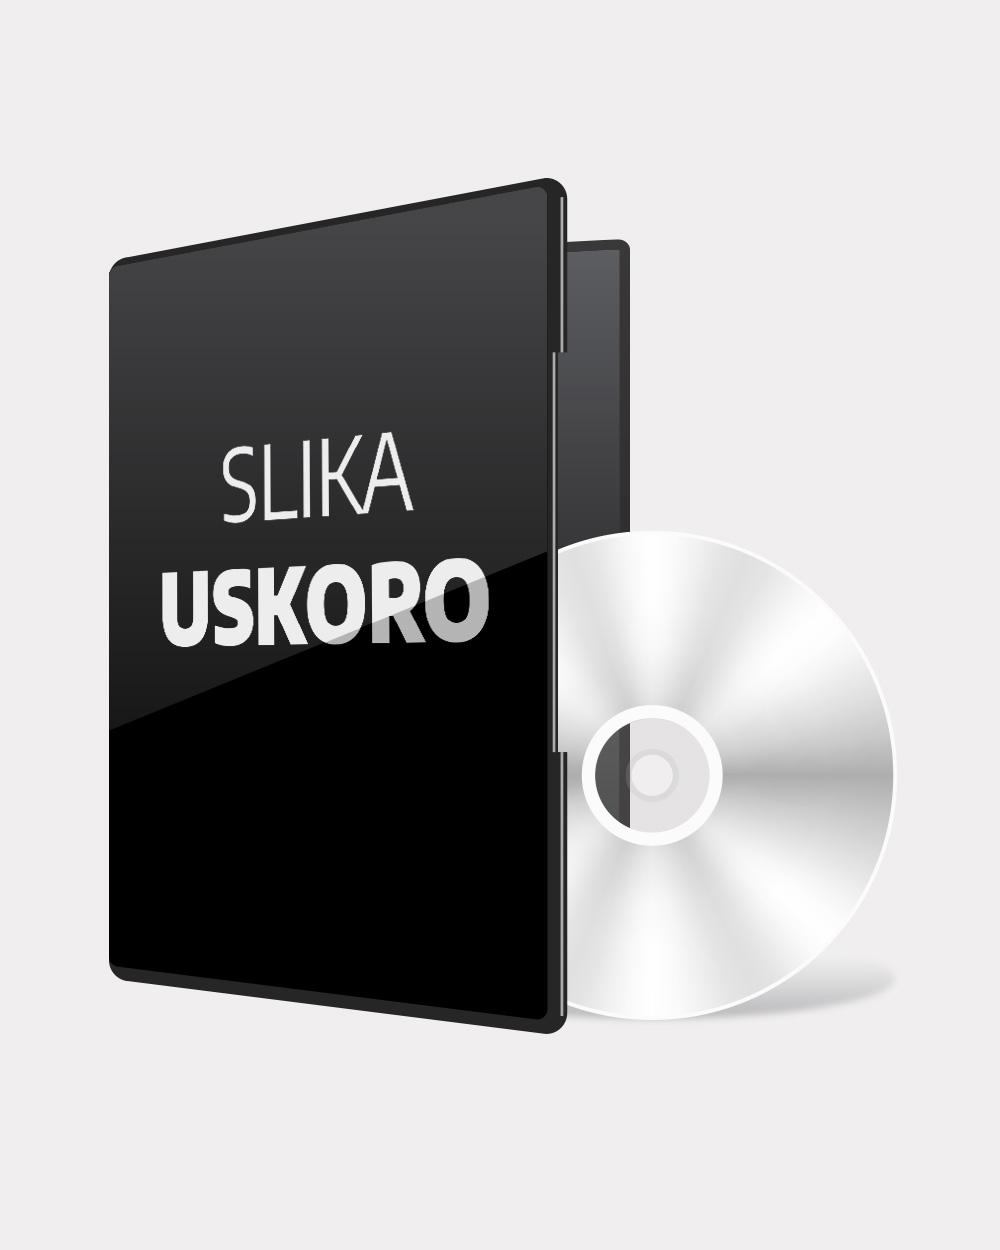 PS4 NBA 2K19 Anniversary Edition